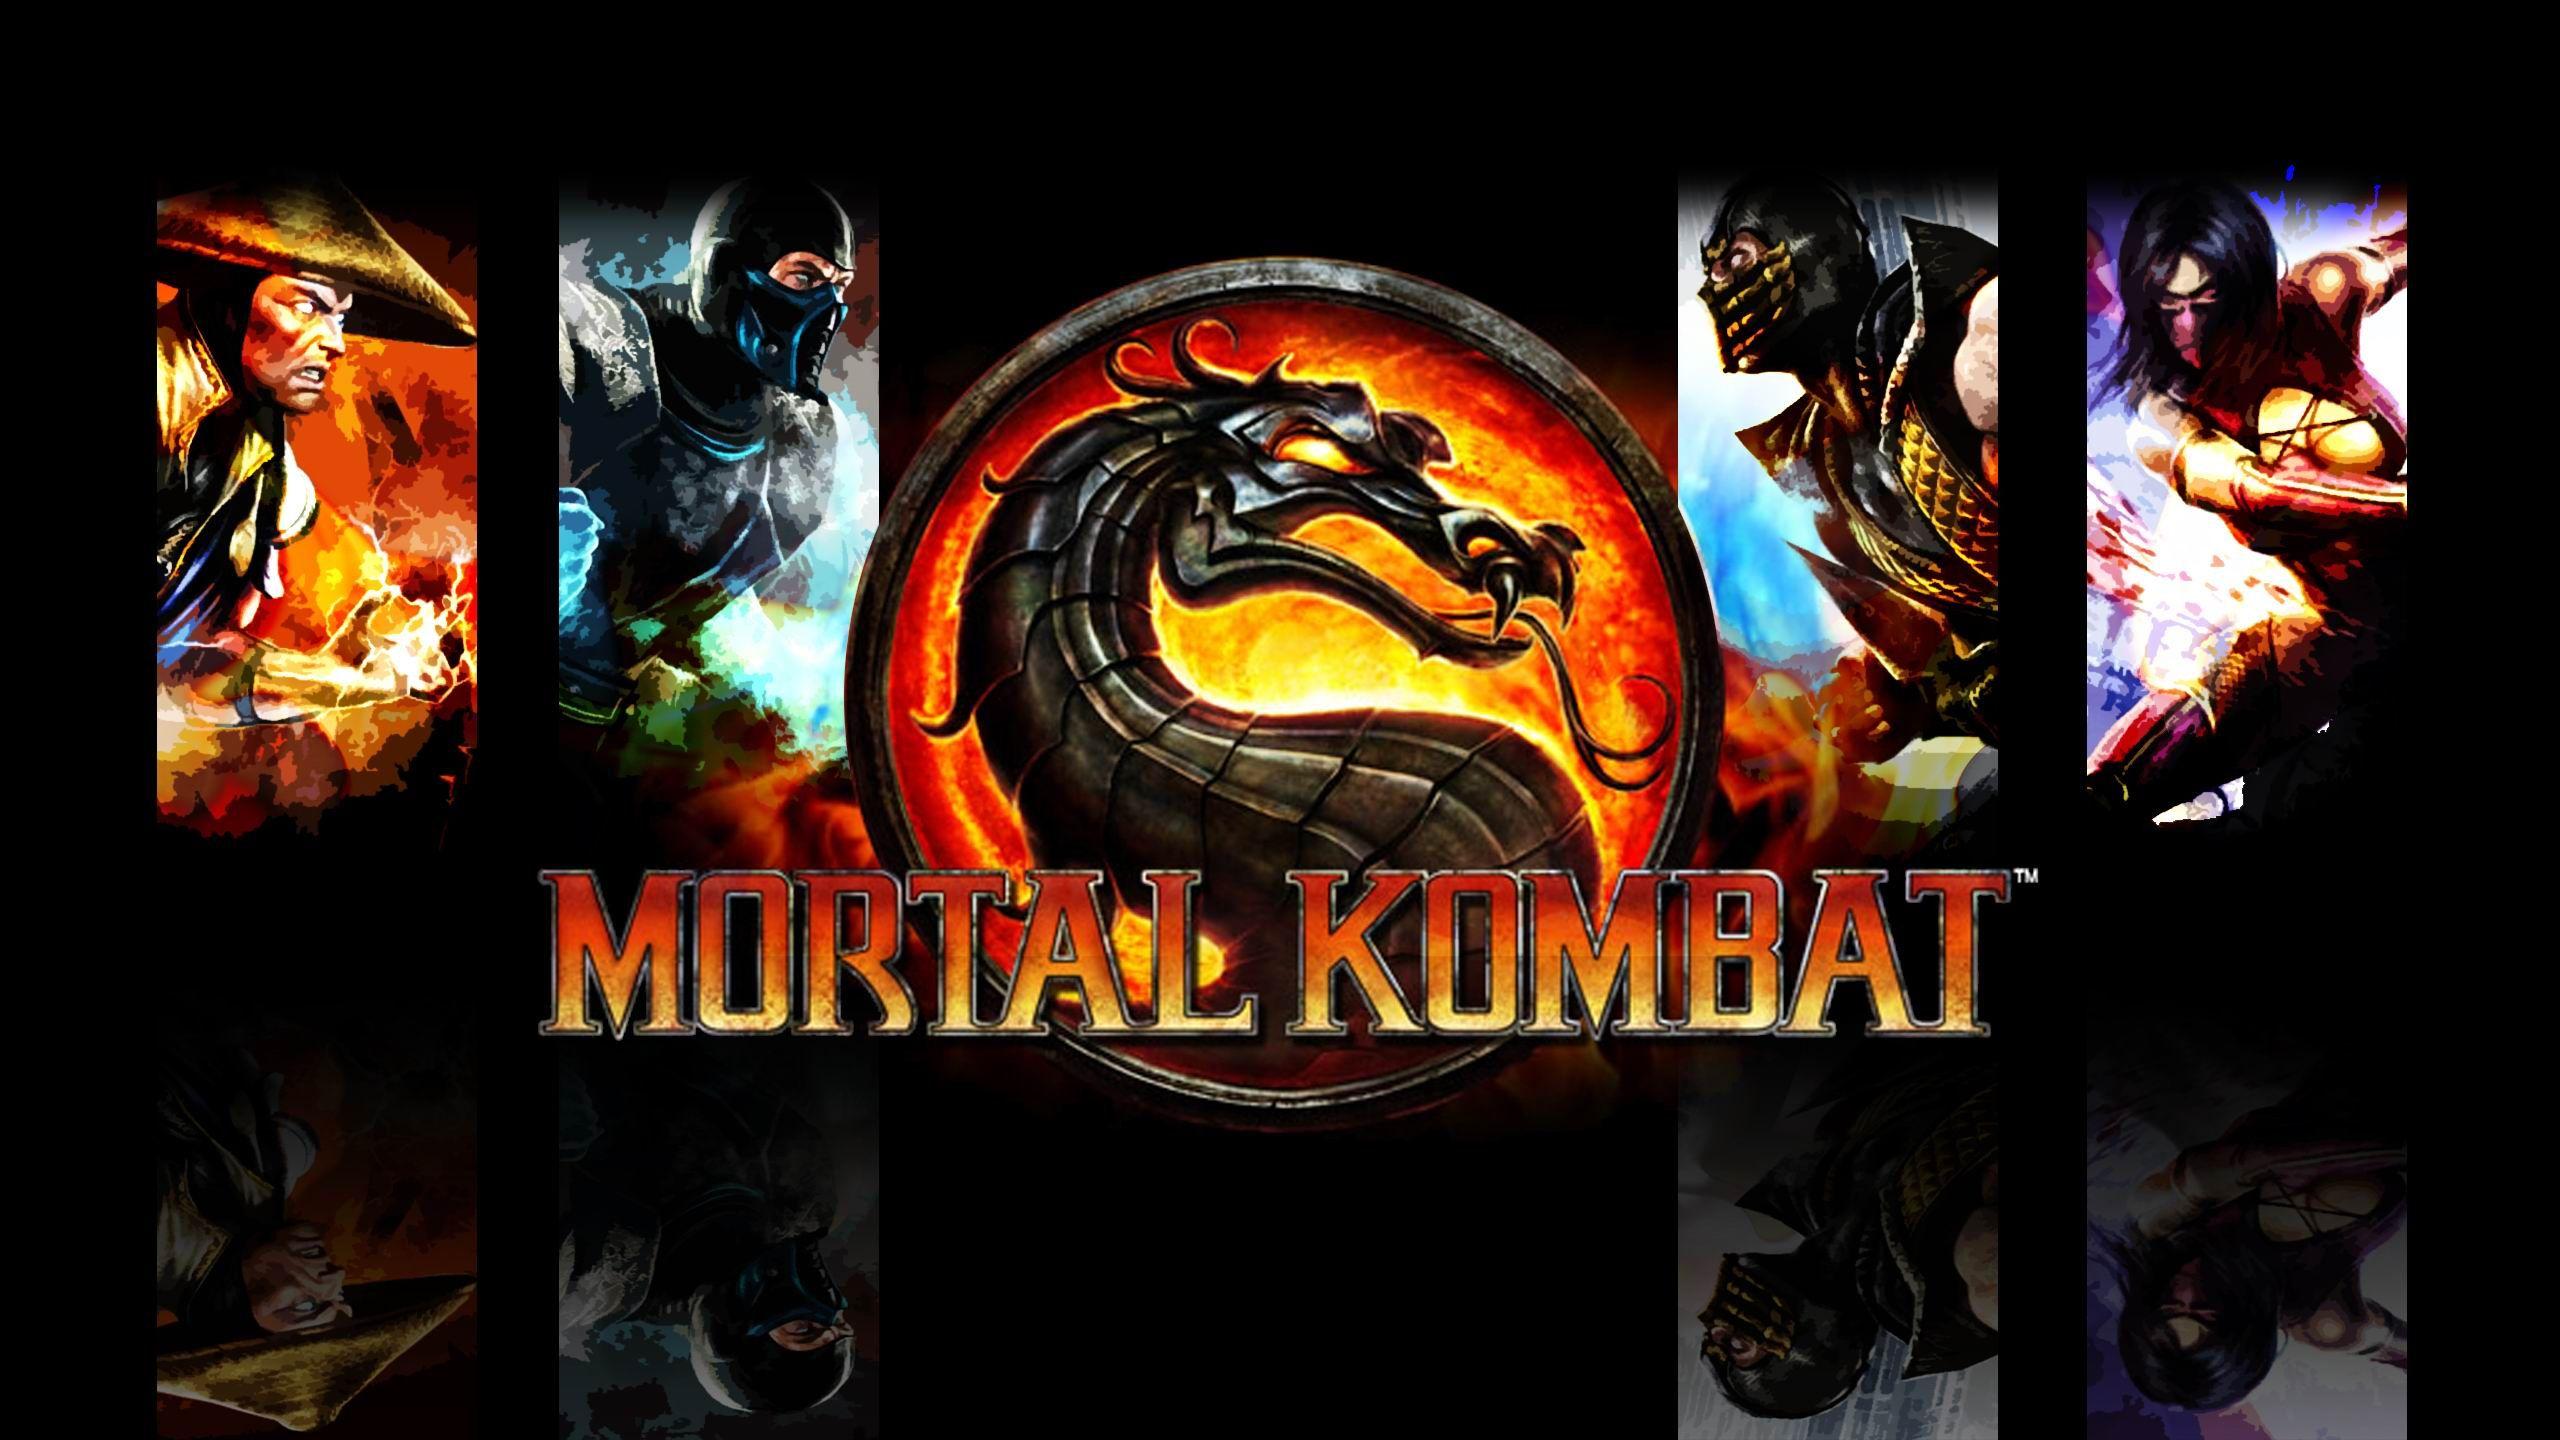 Mortal Kombat Exclusive HD Wallpapers 4081 2560x1440